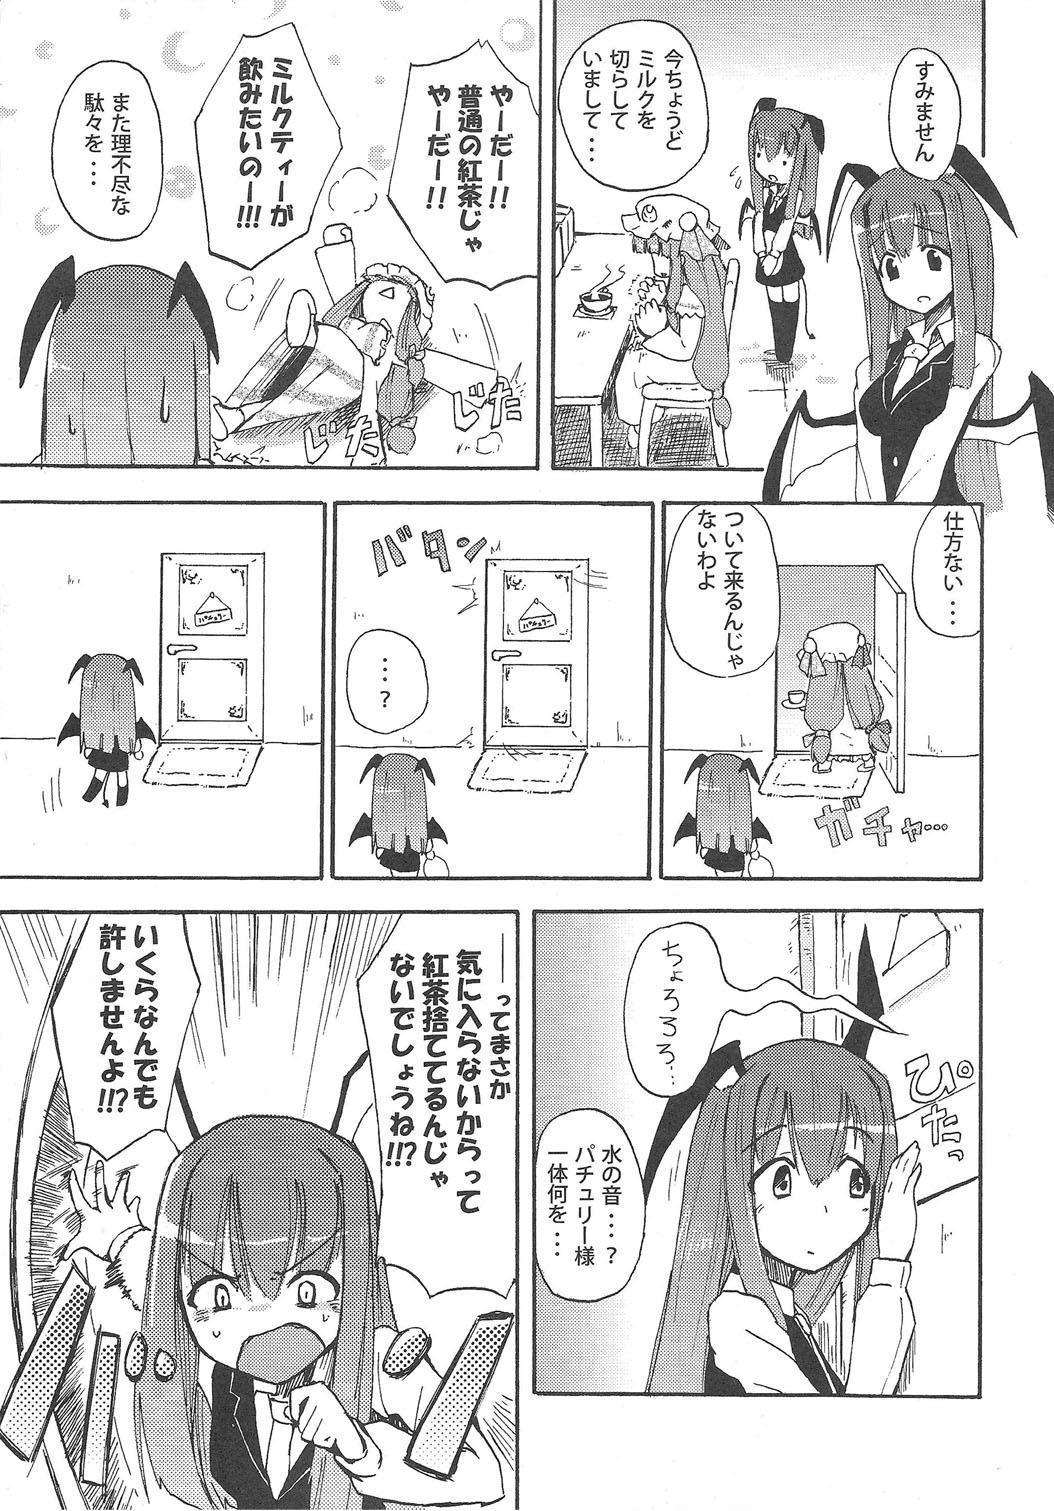 Homuraya Milk ★ Collection 11